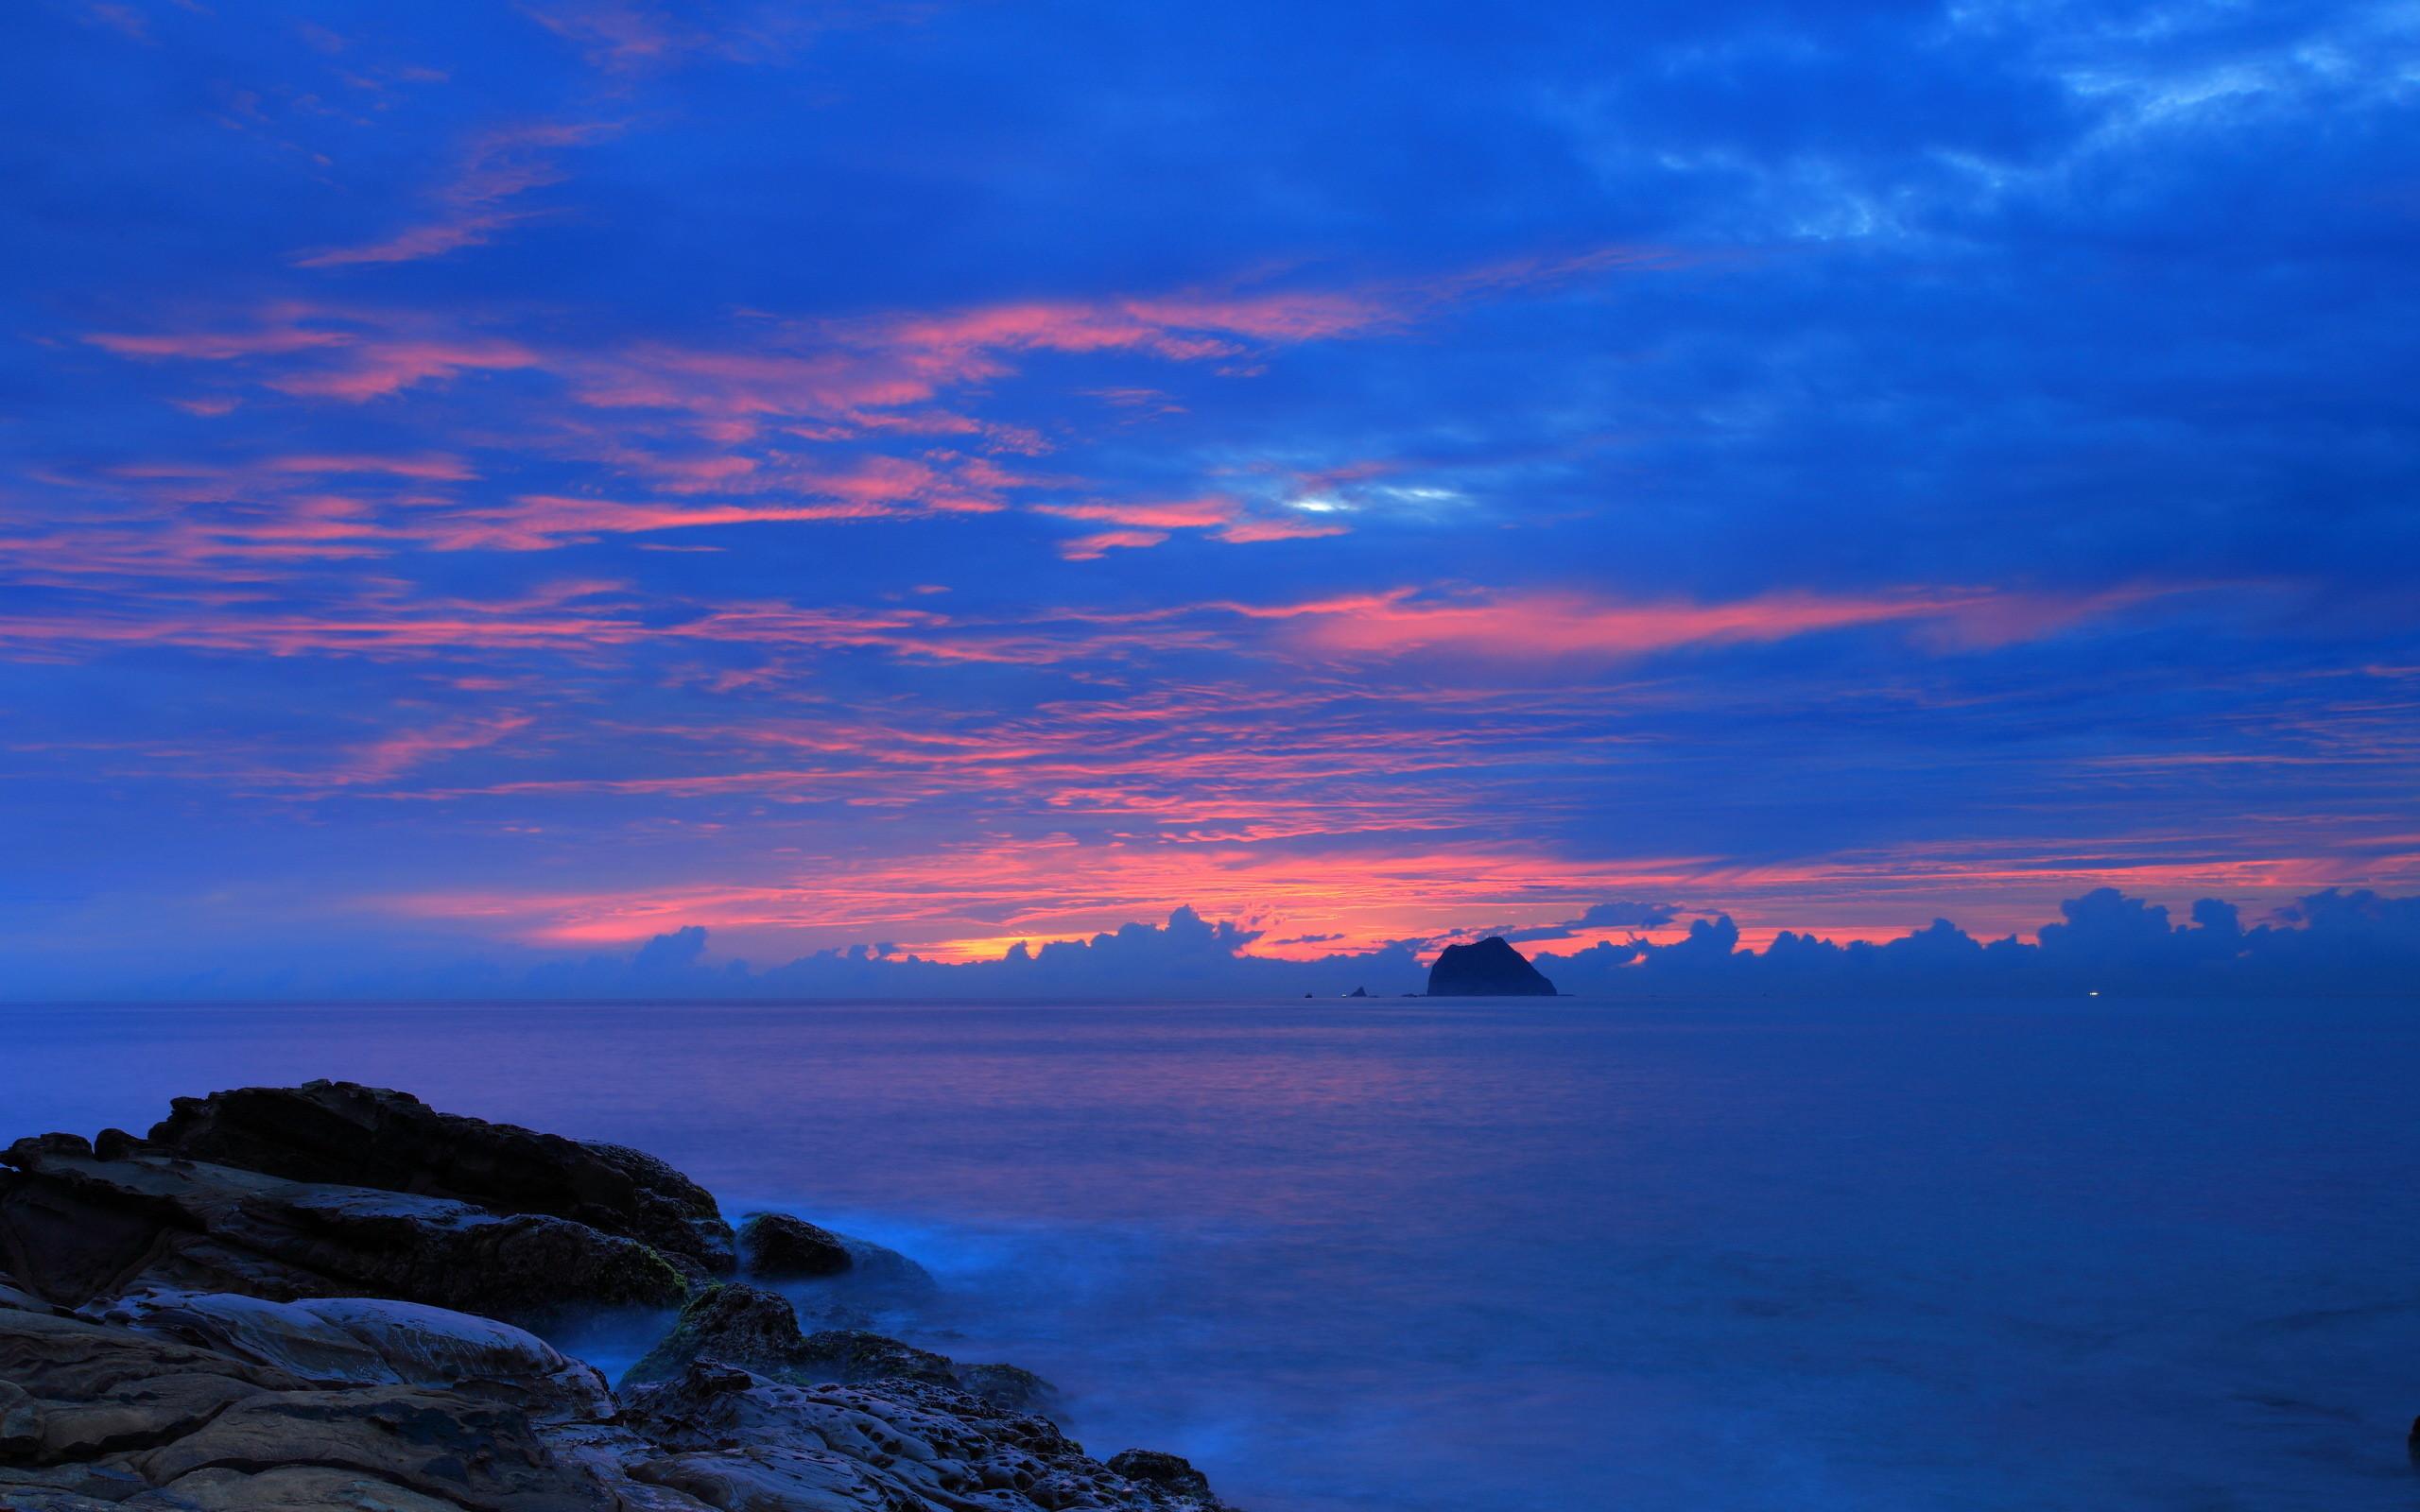 Blue Night Cloudy Sky